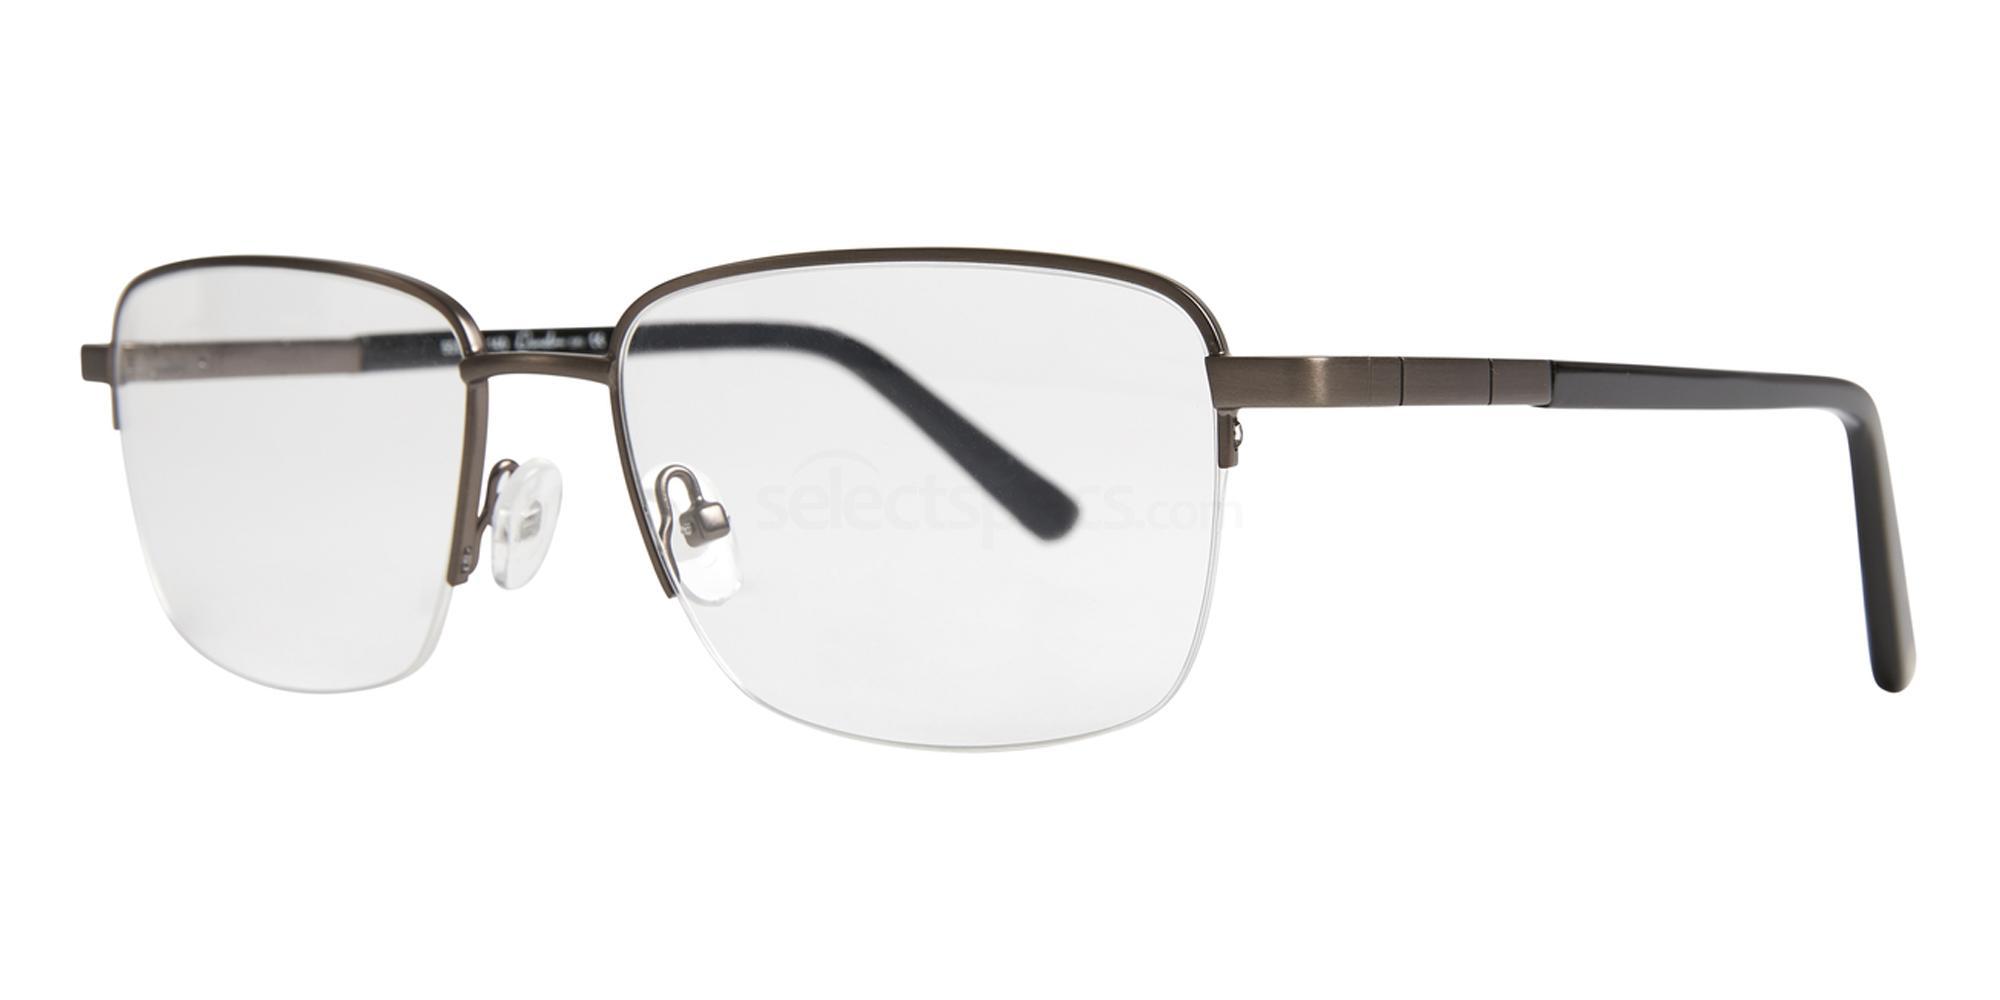 C1 896 Glasses, Julian Beaumont